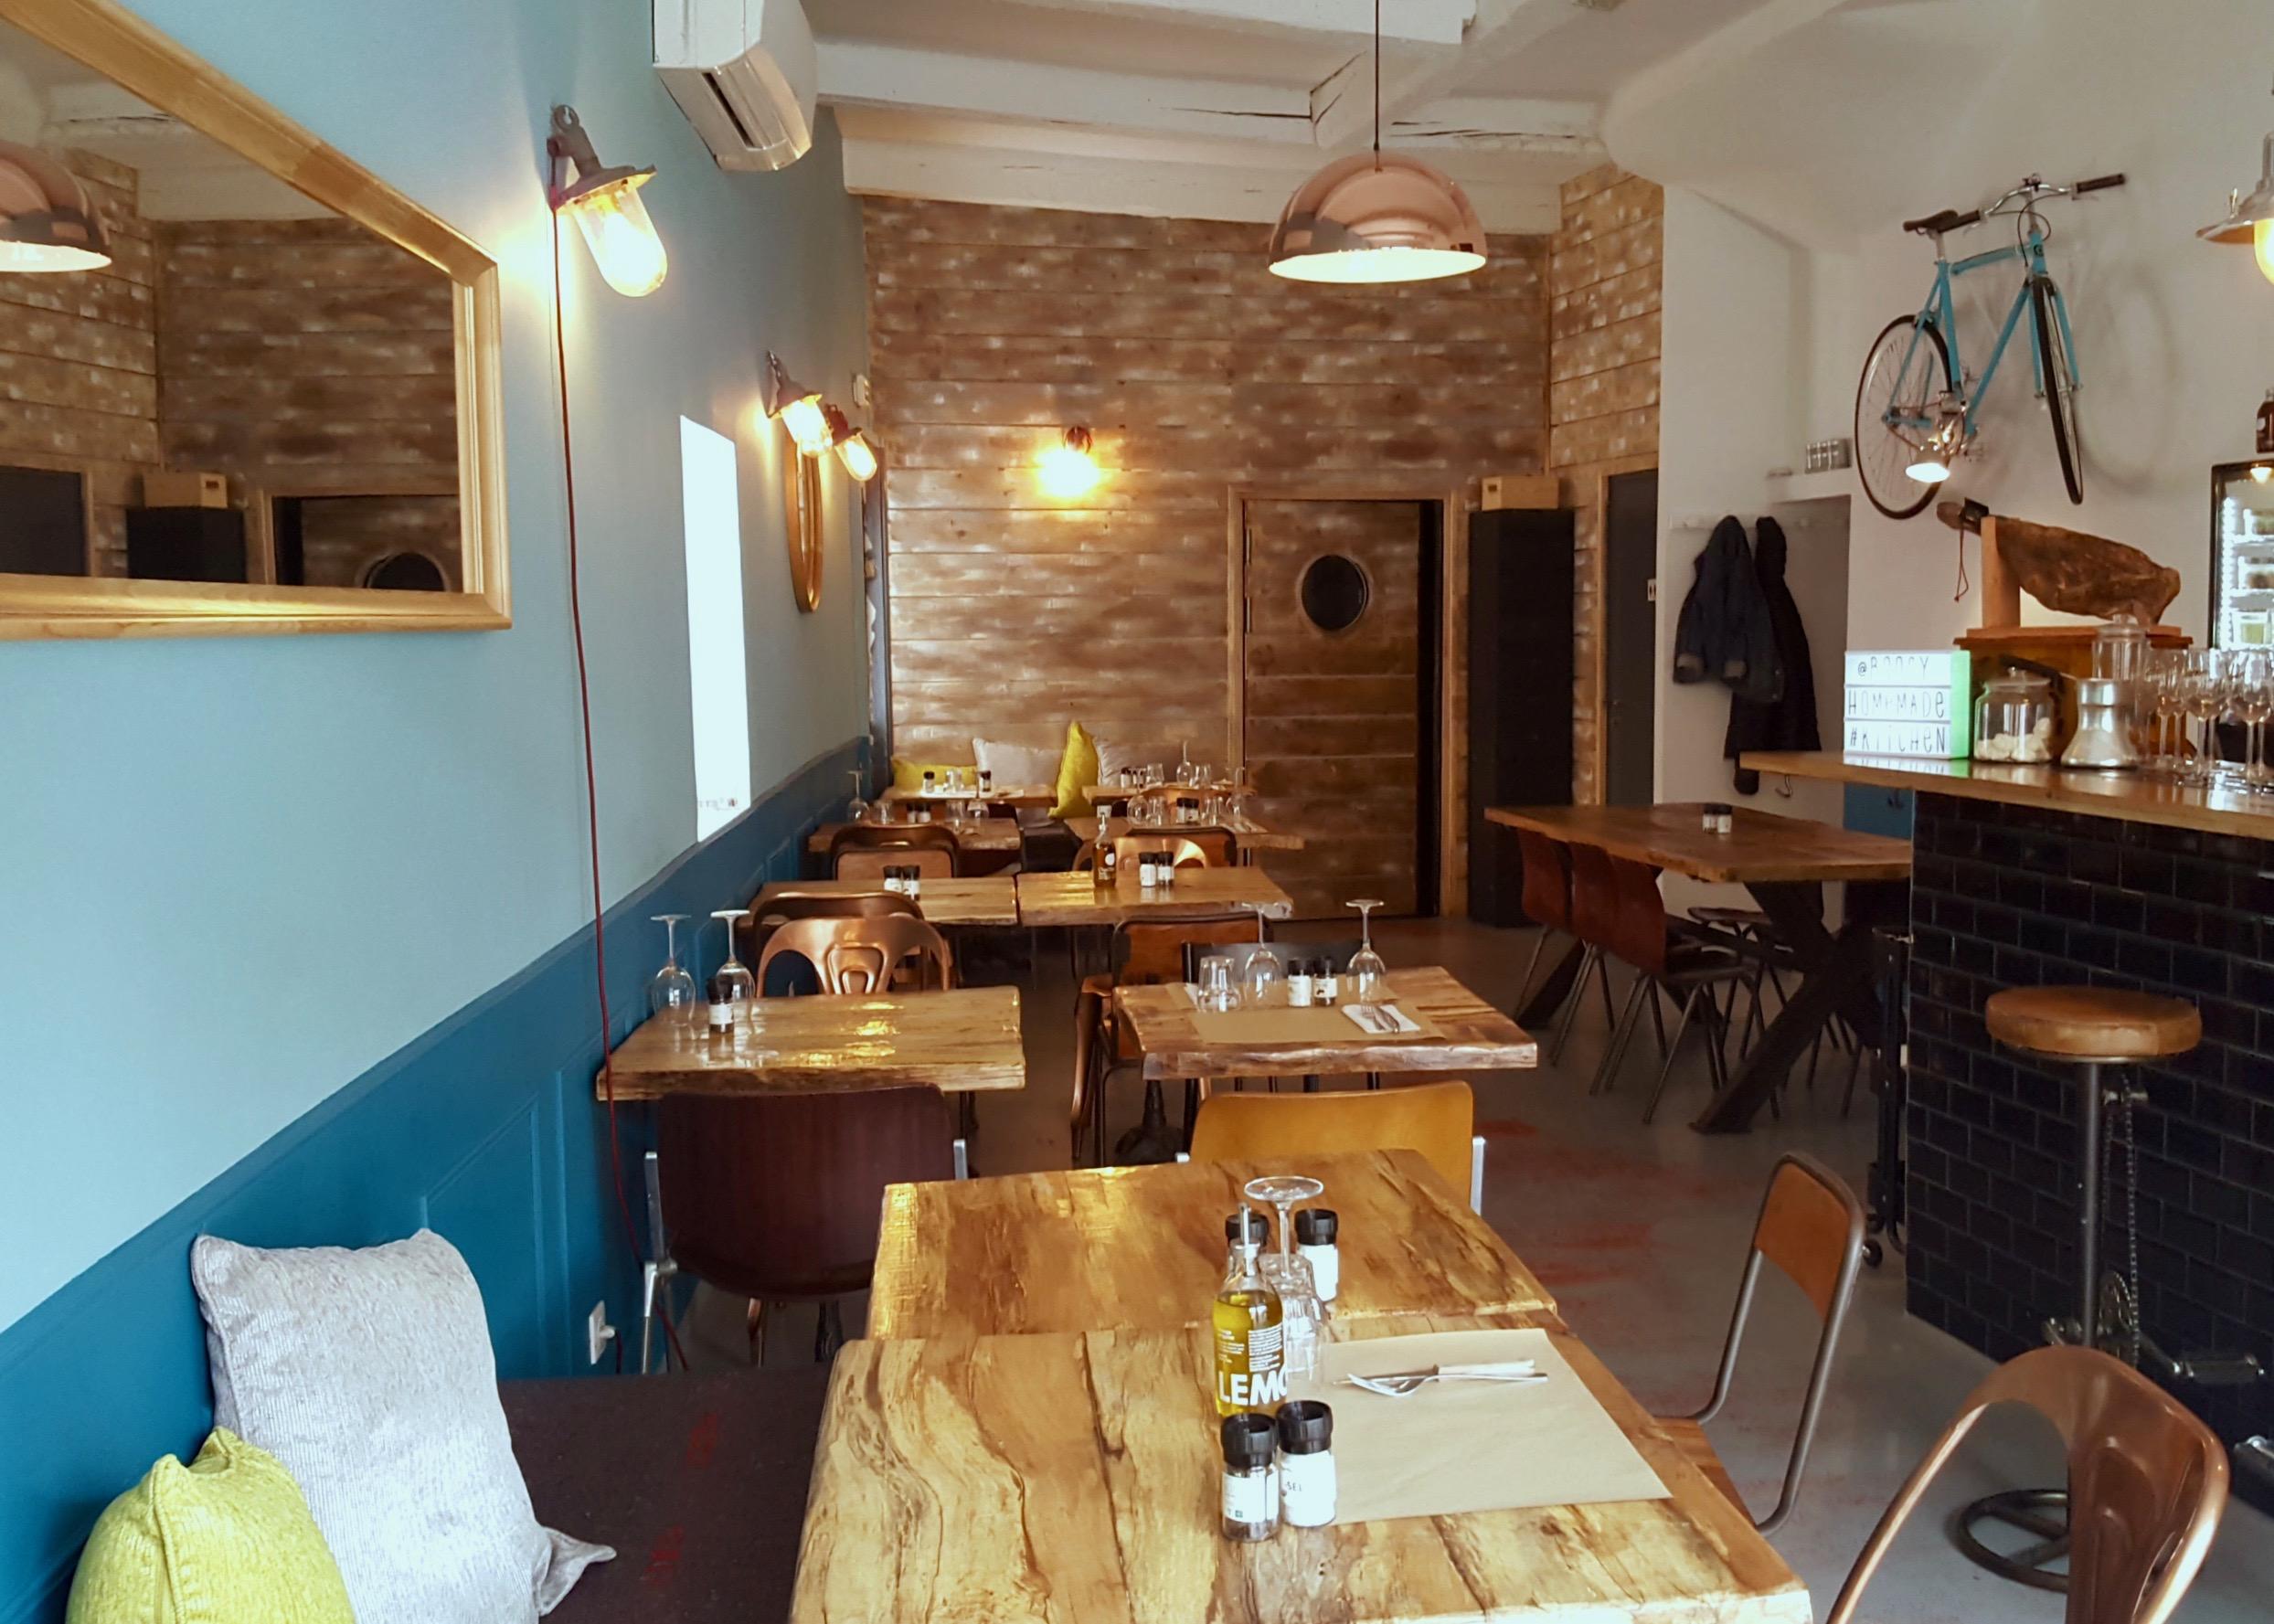 Cuisine italienne et burgers la salle manger love spots for Salle a manger vilvoorde restaurant